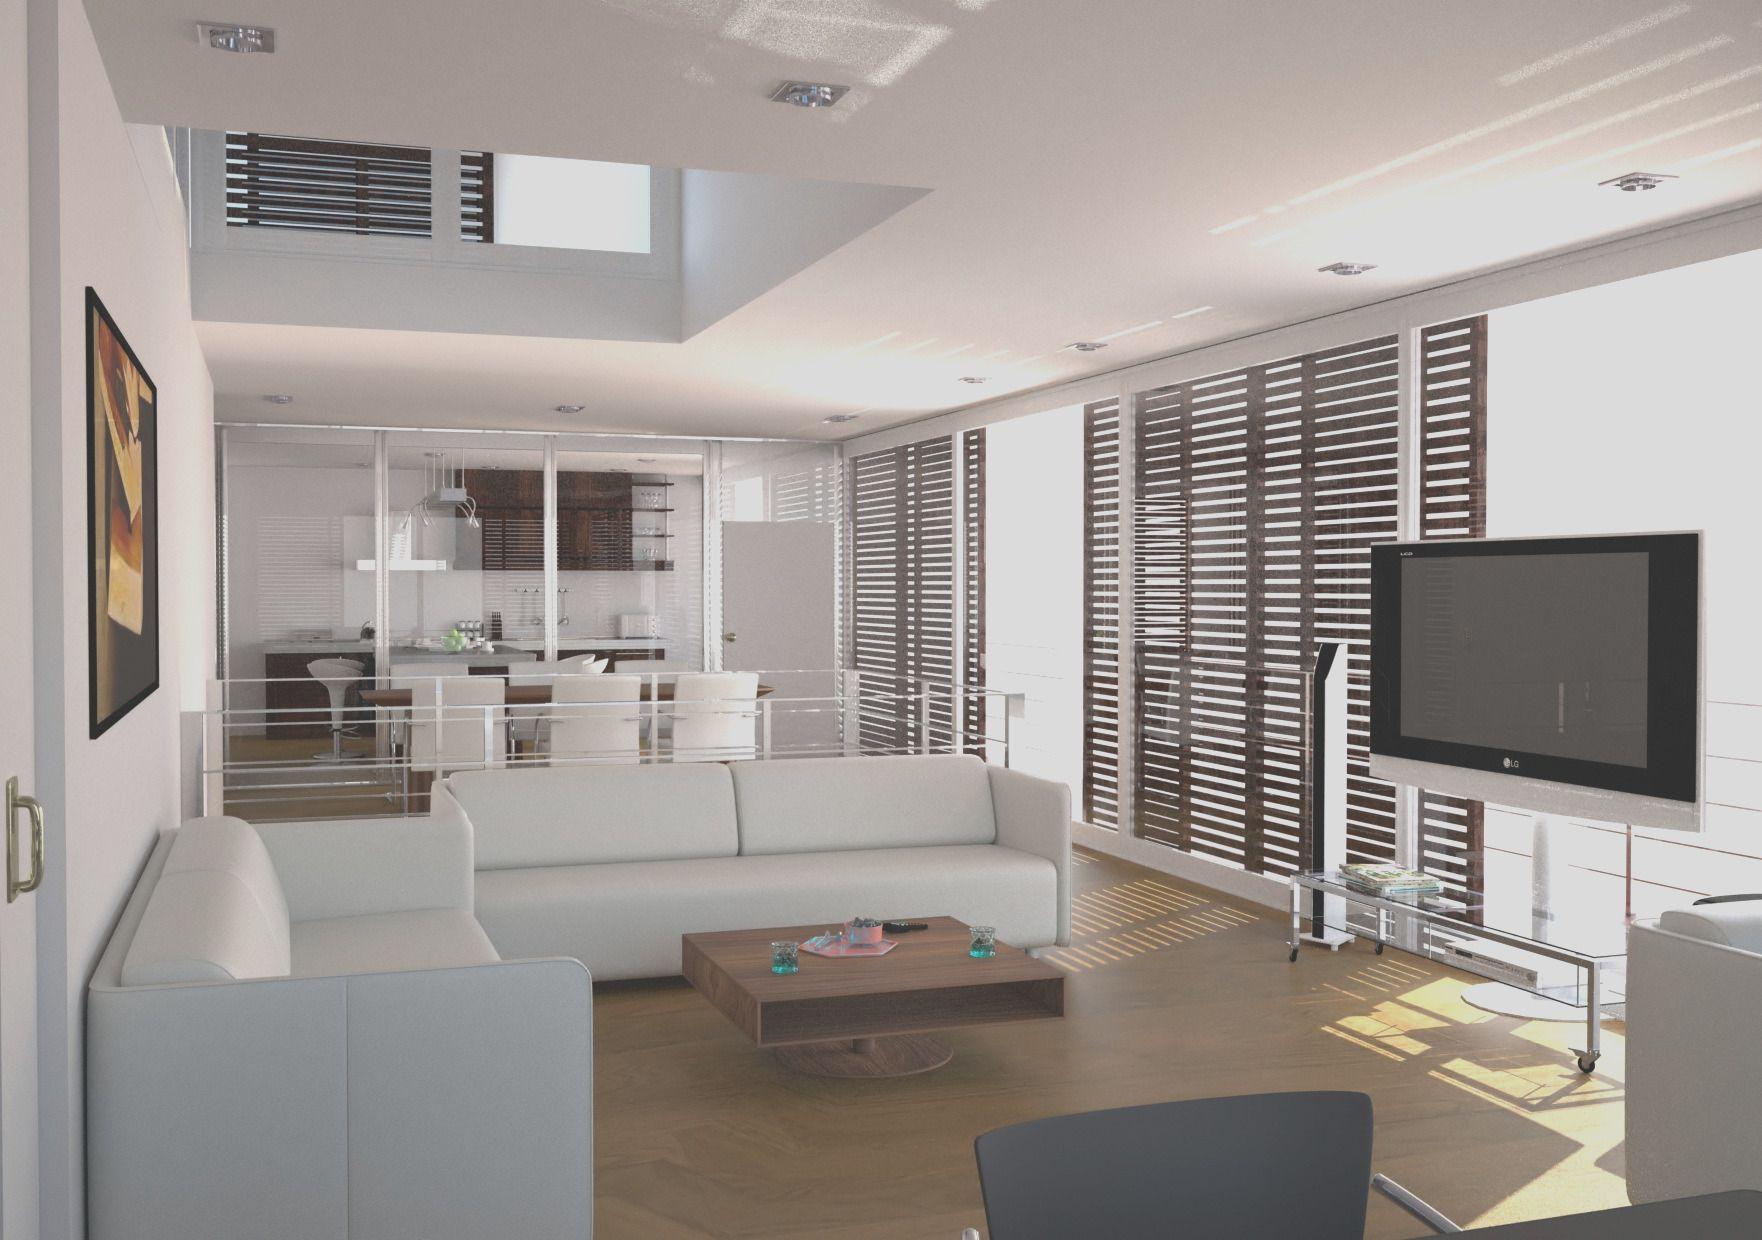 48 Stunning Modern House Design Interior Ideas In 2020 Modern Apartment Design Townhouse Interior Tiny House Decor